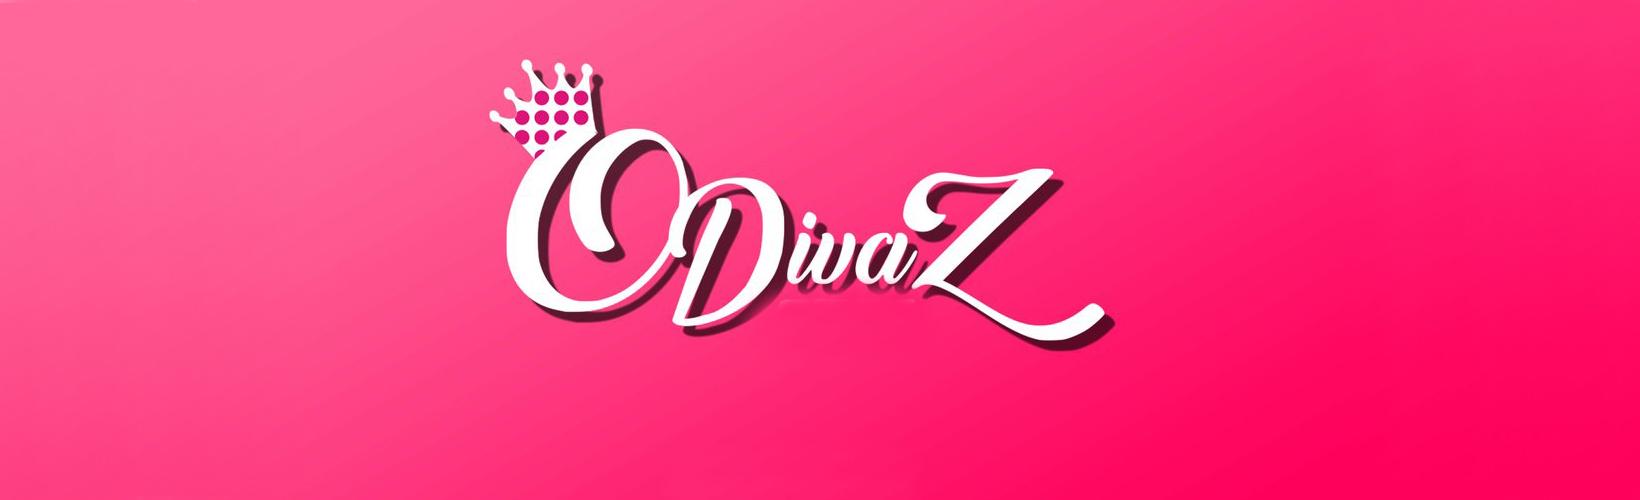 ODZ DivaZ